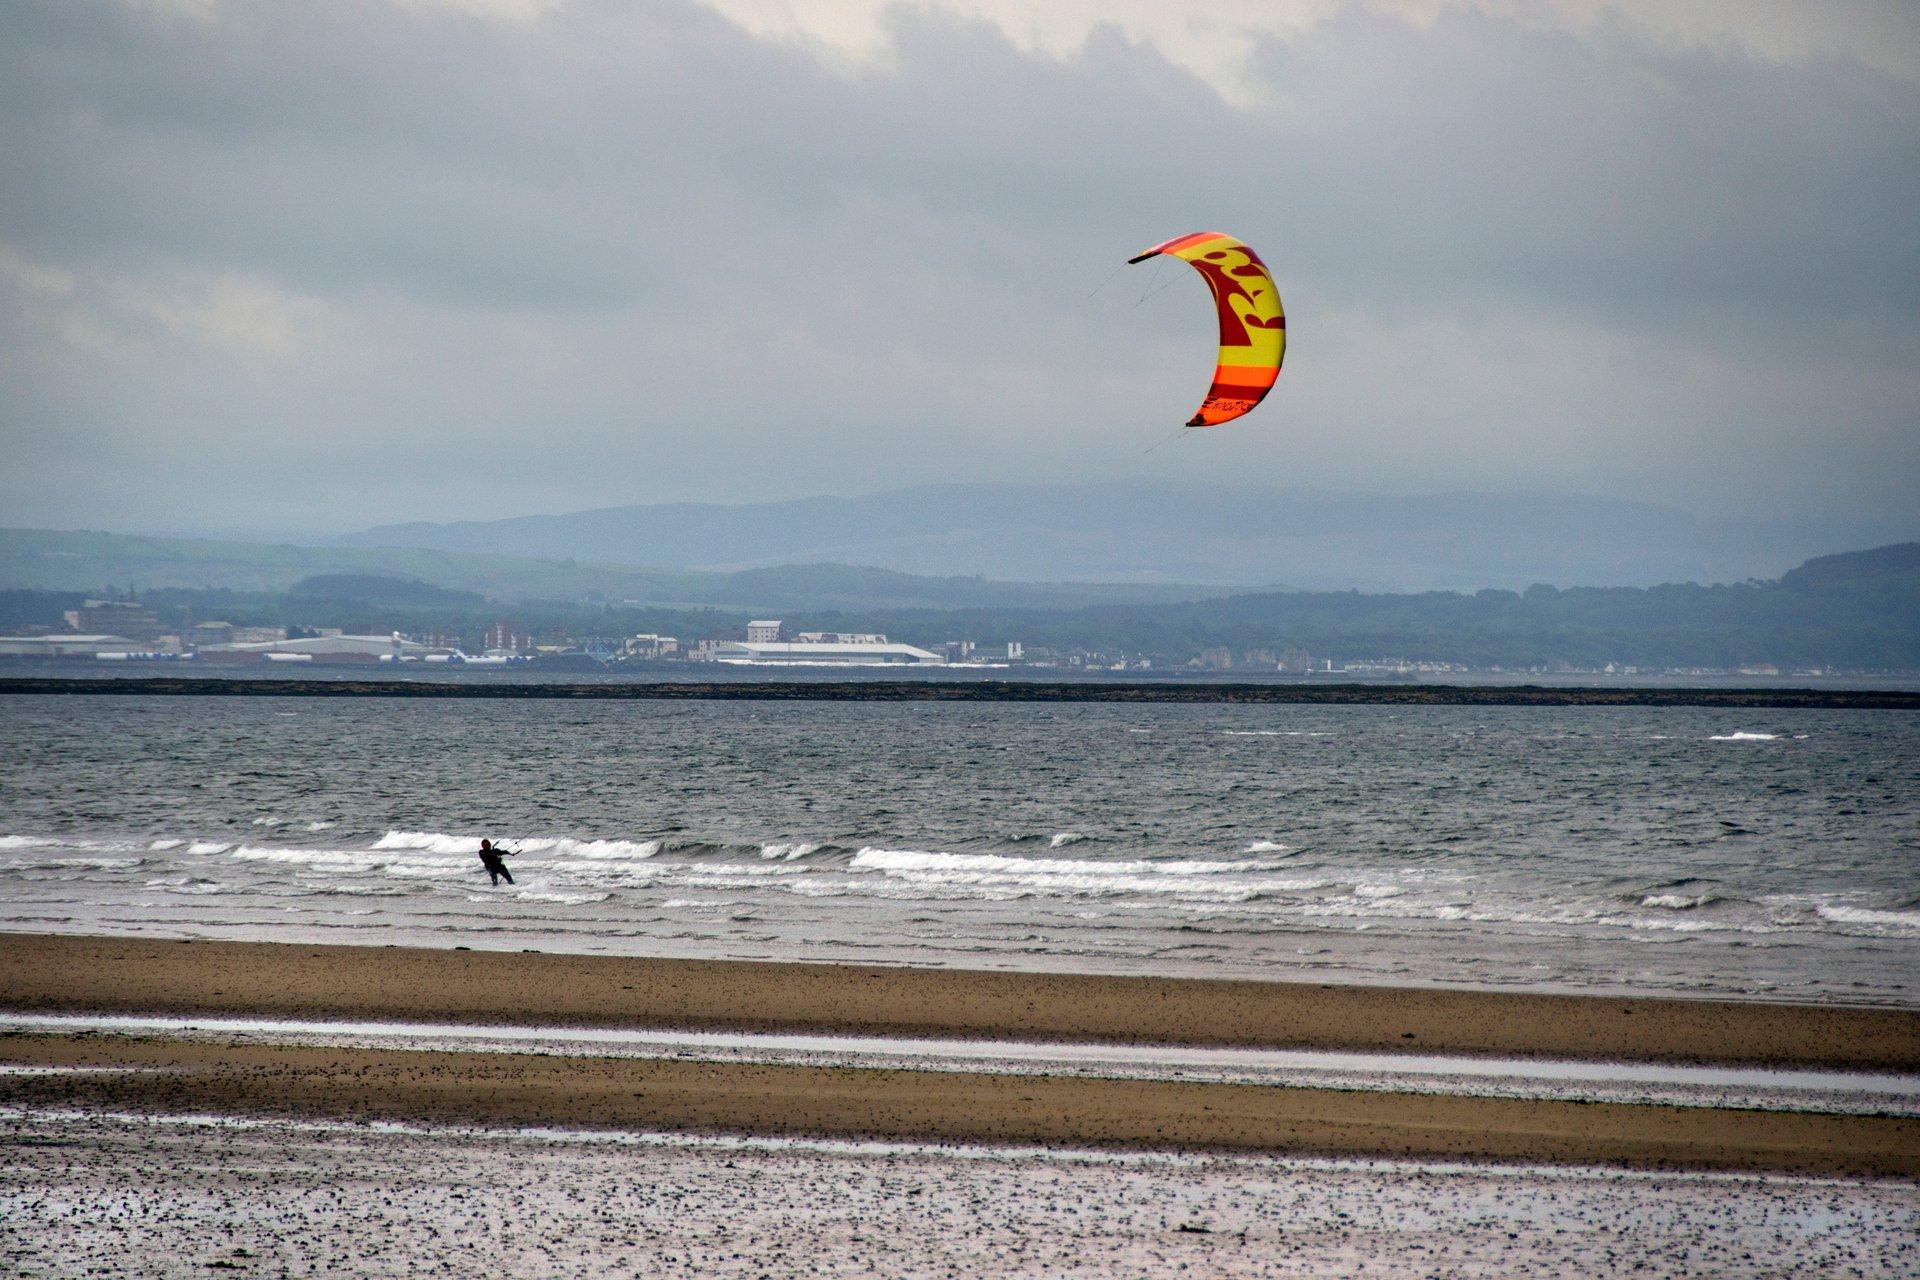 Kitesurfing & Windsurfing in The United Kingdom 2020 - Best Time